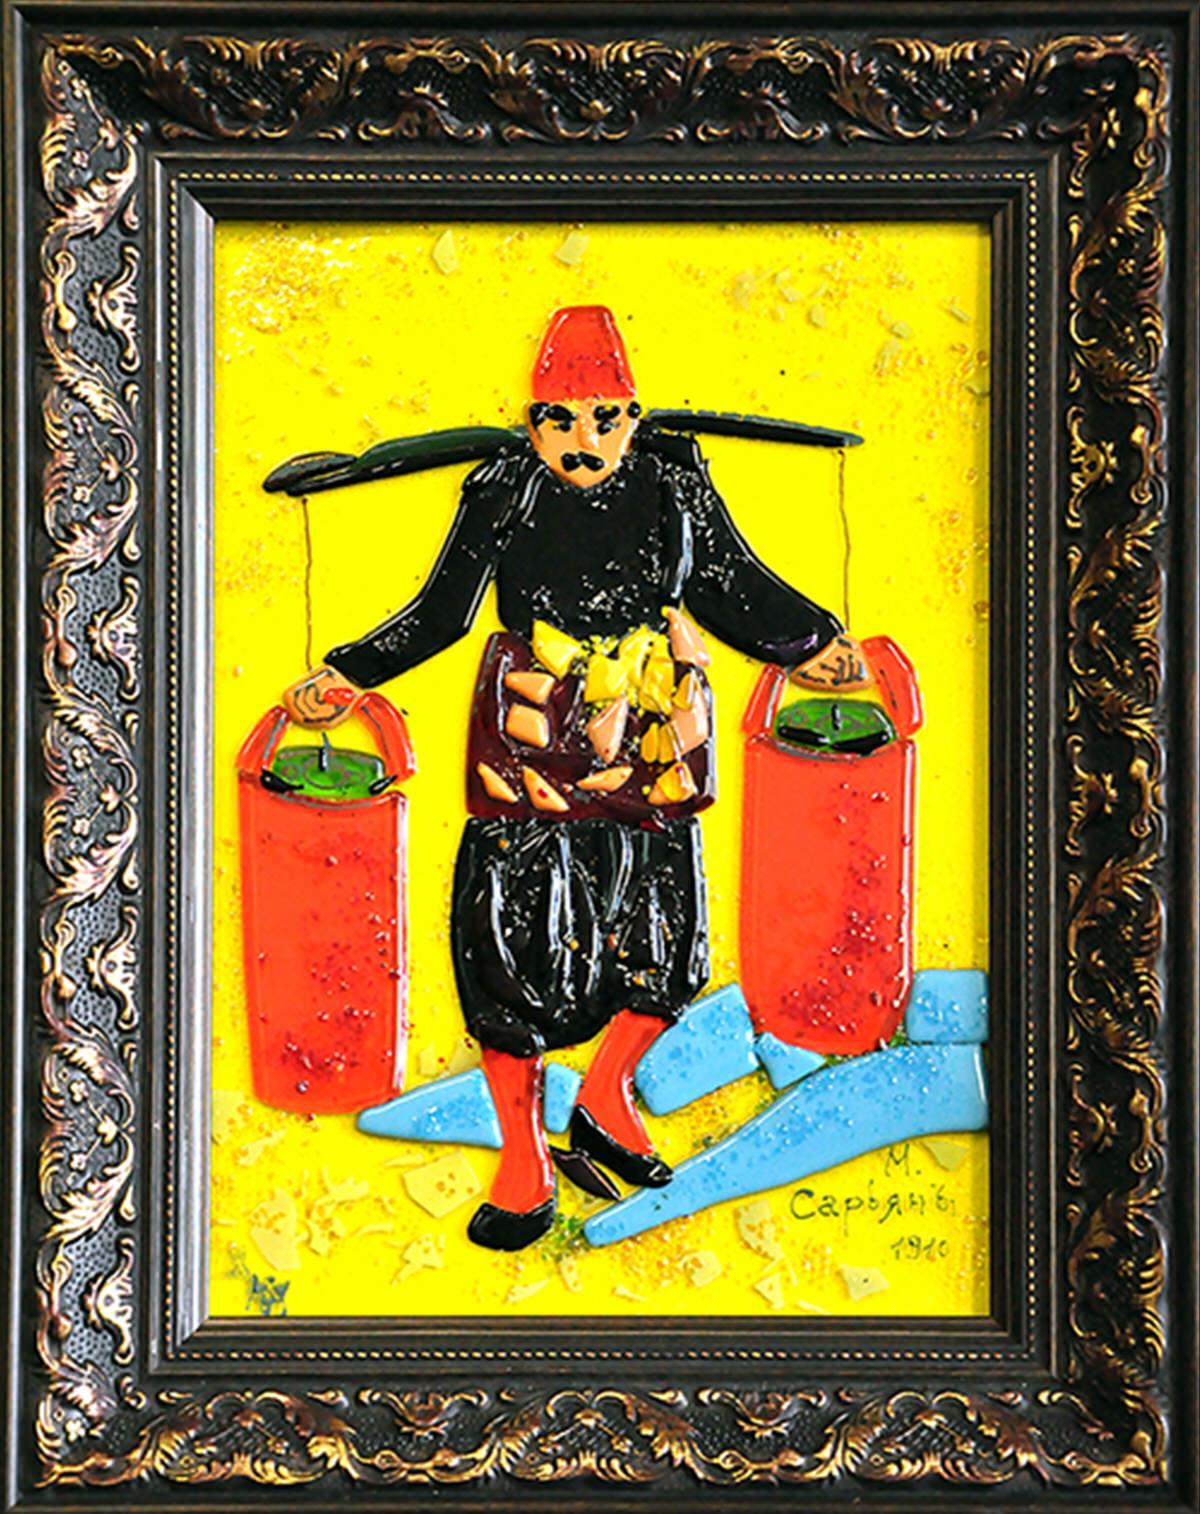 Мартирос Сарьян - Продавец лимонада